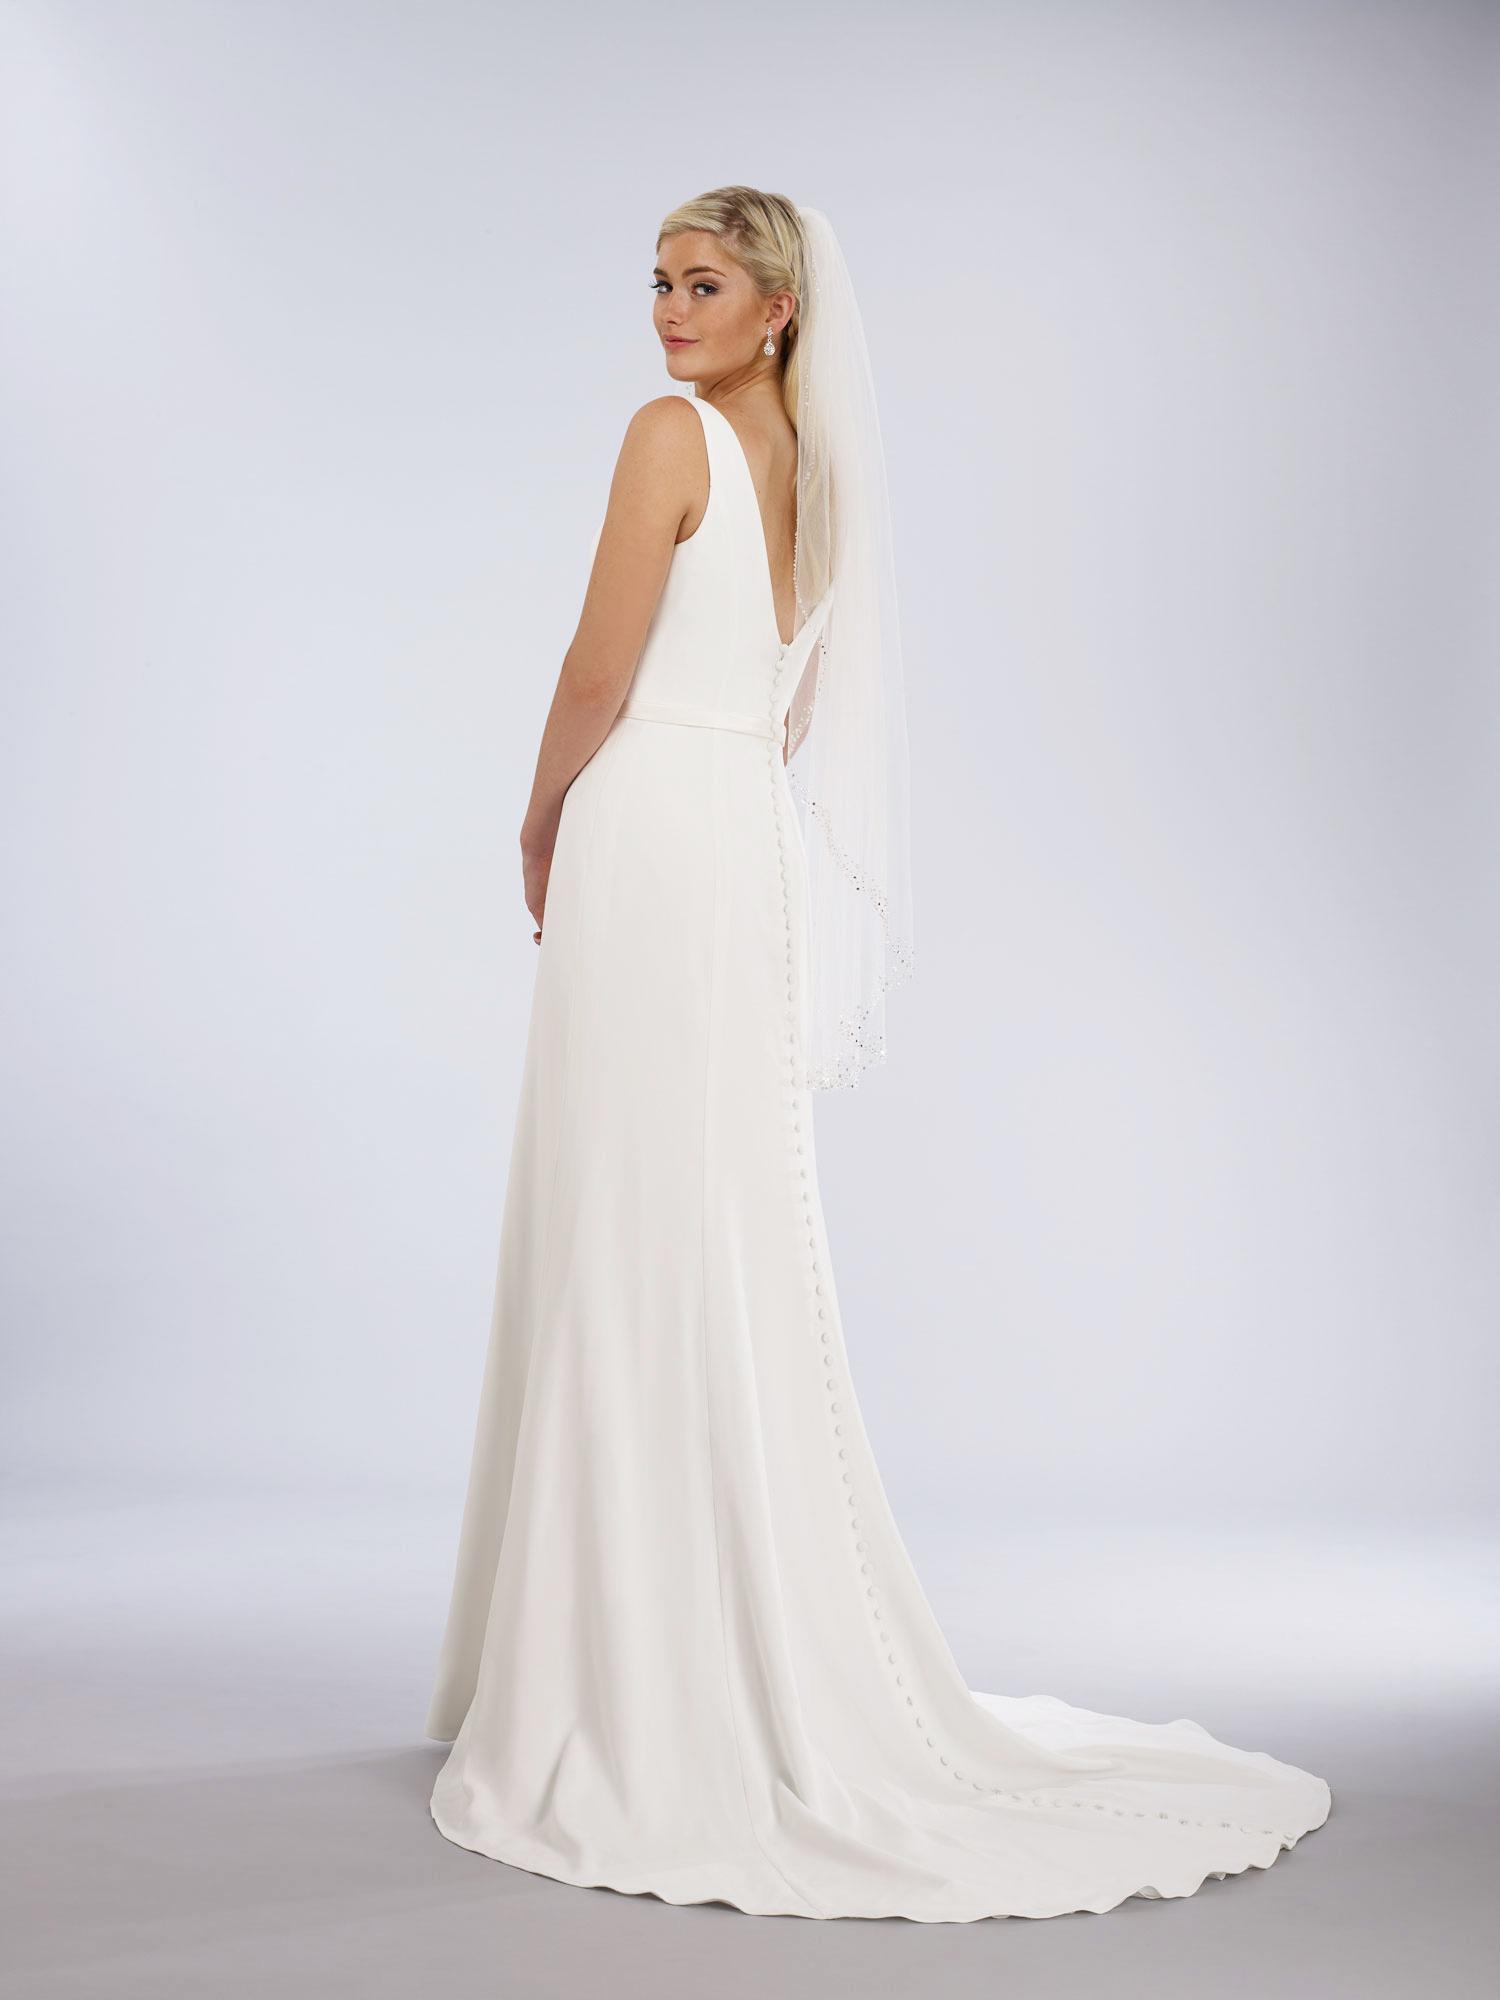 natural waist slim a-line wedding gown